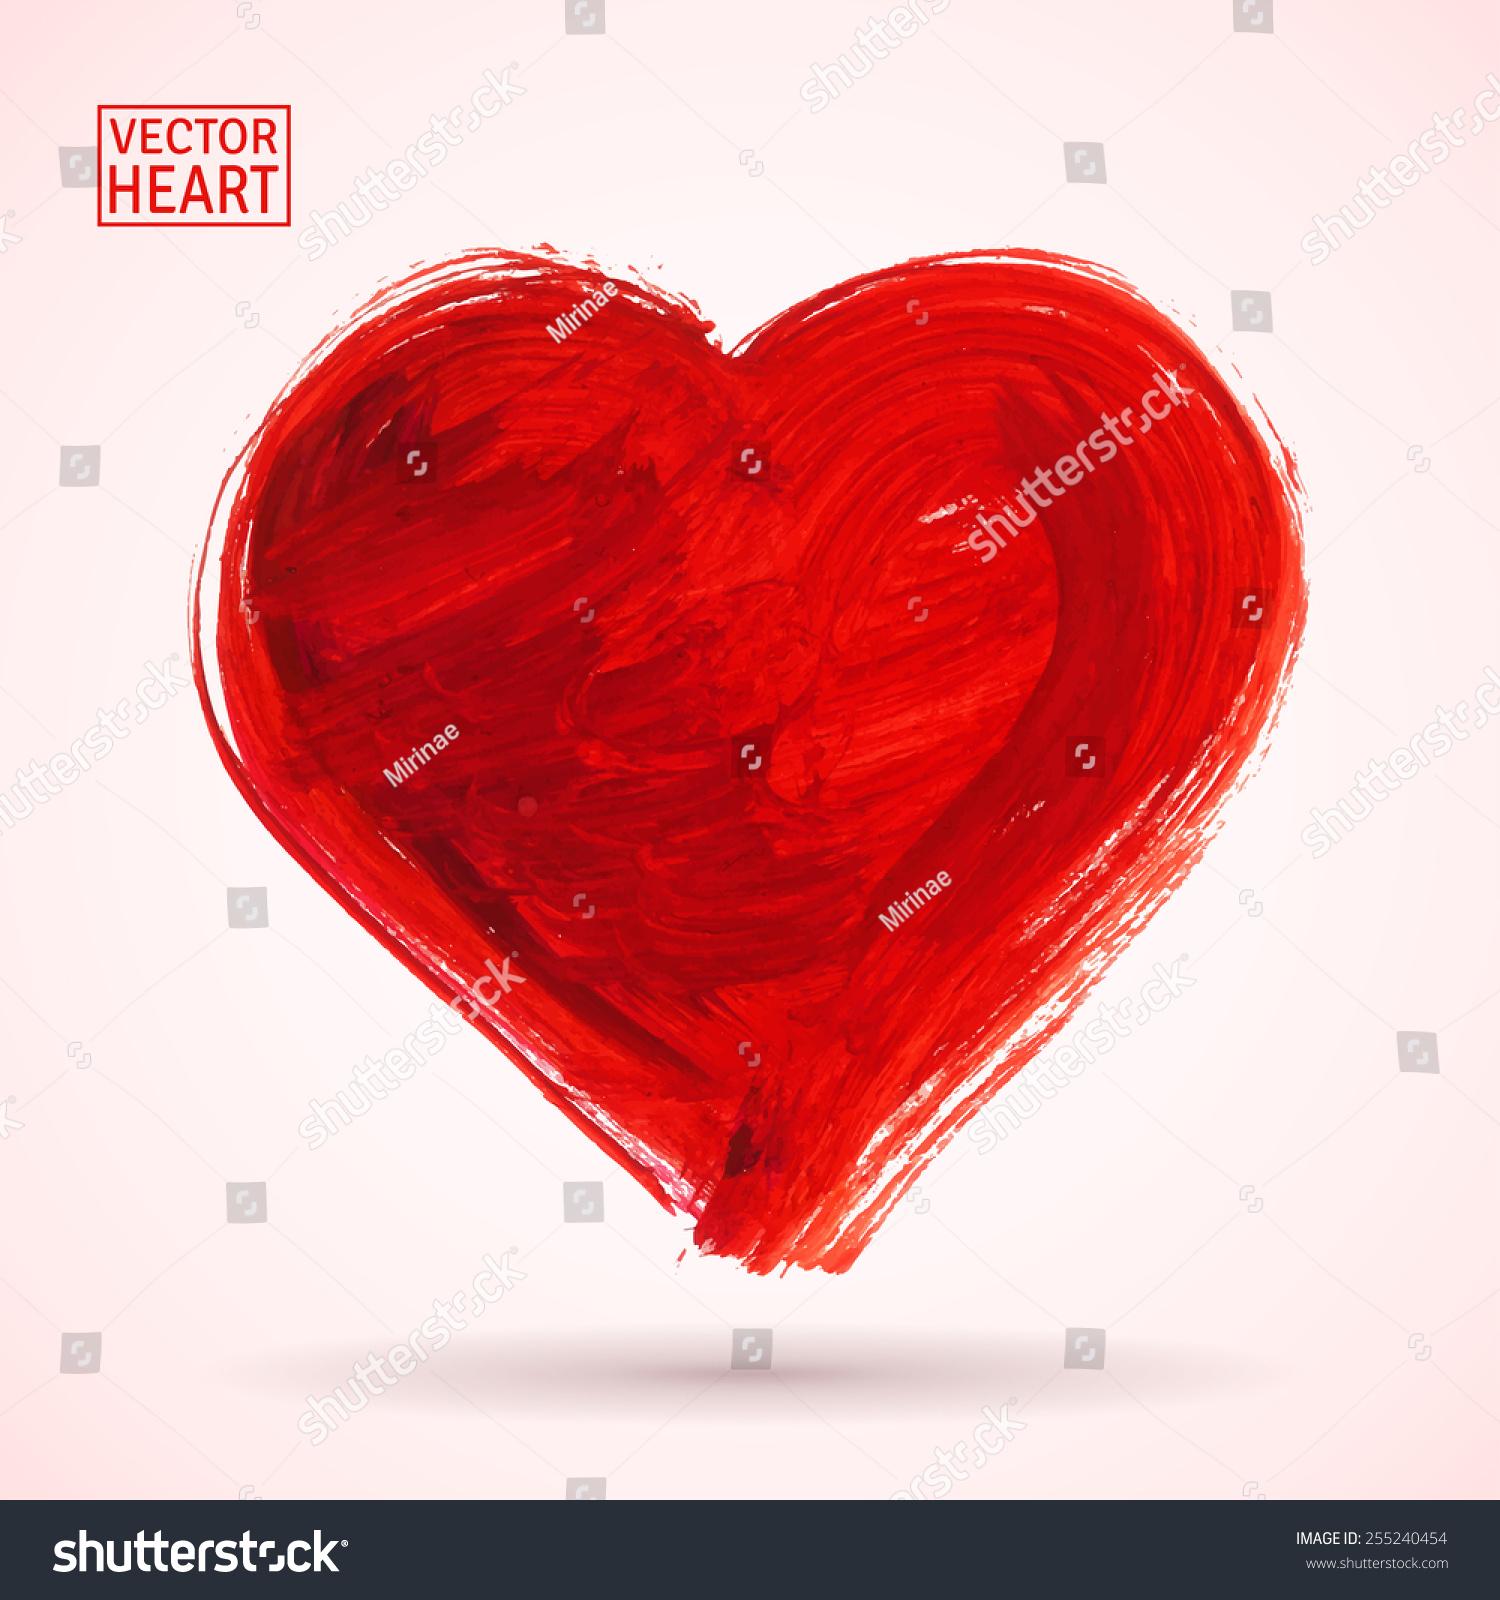 half hand heart gallery - photo #30